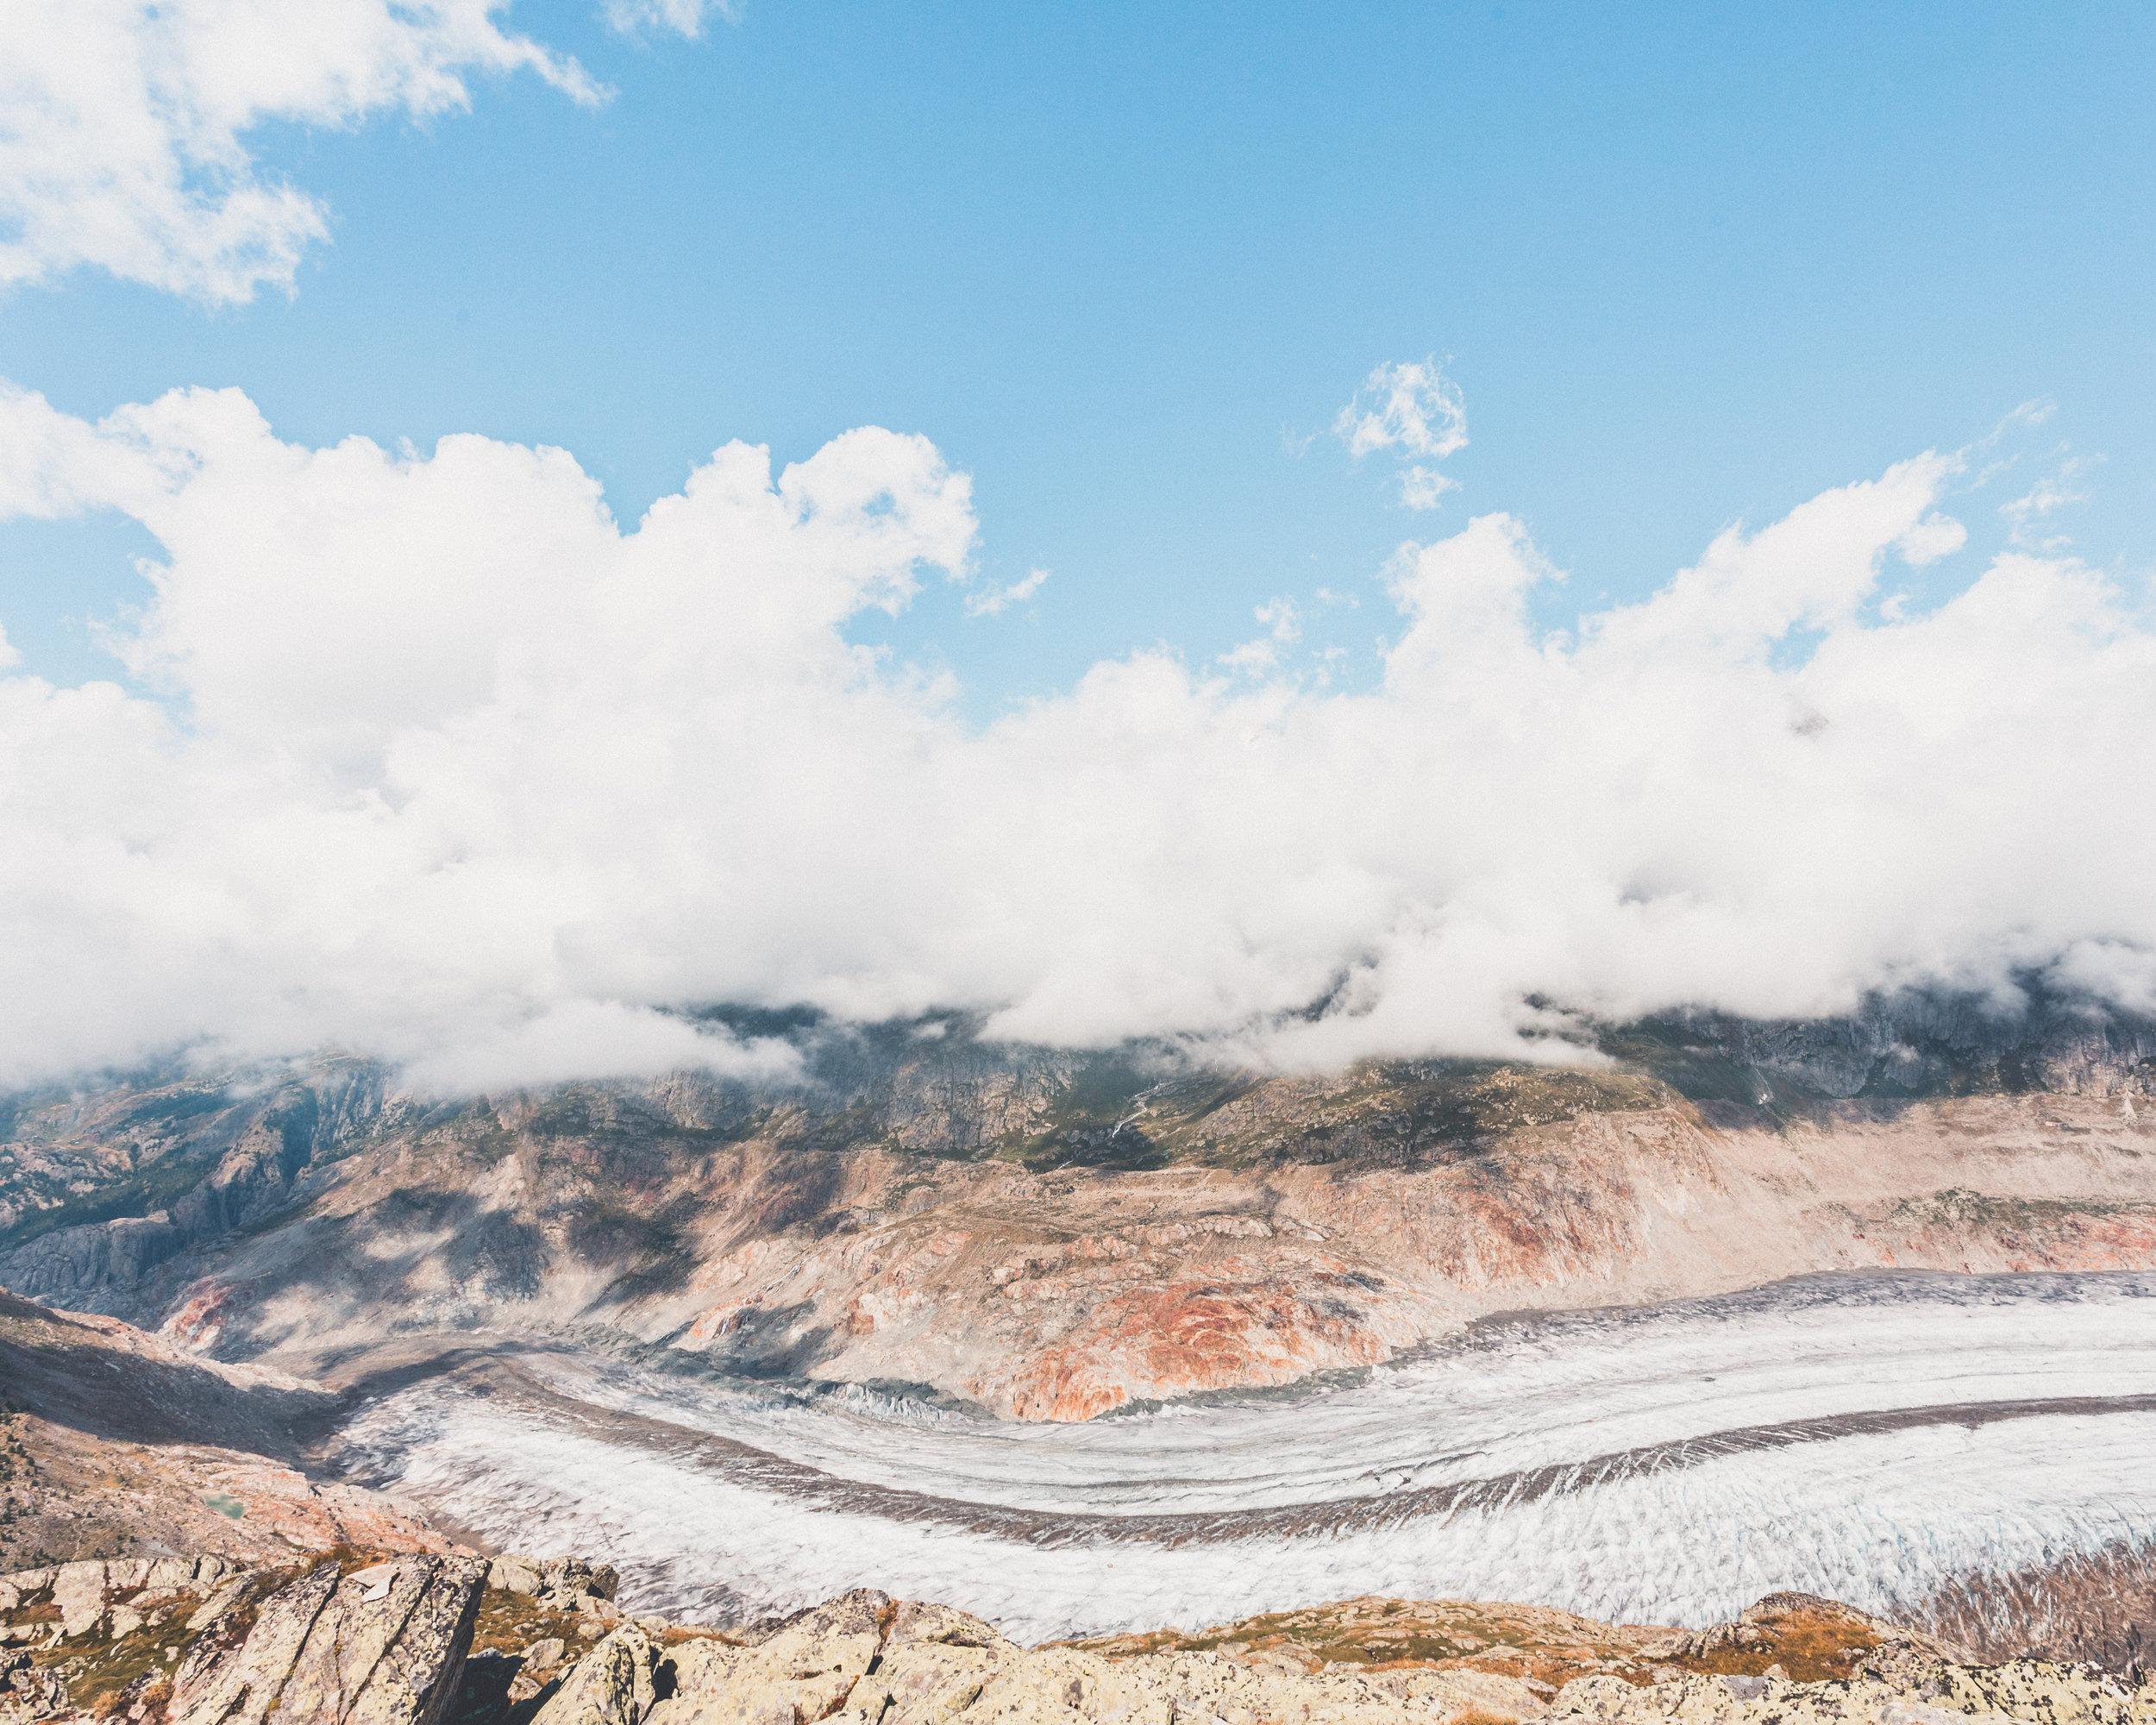 Daan Annemans Hippo Magazine Cloudy Mountains